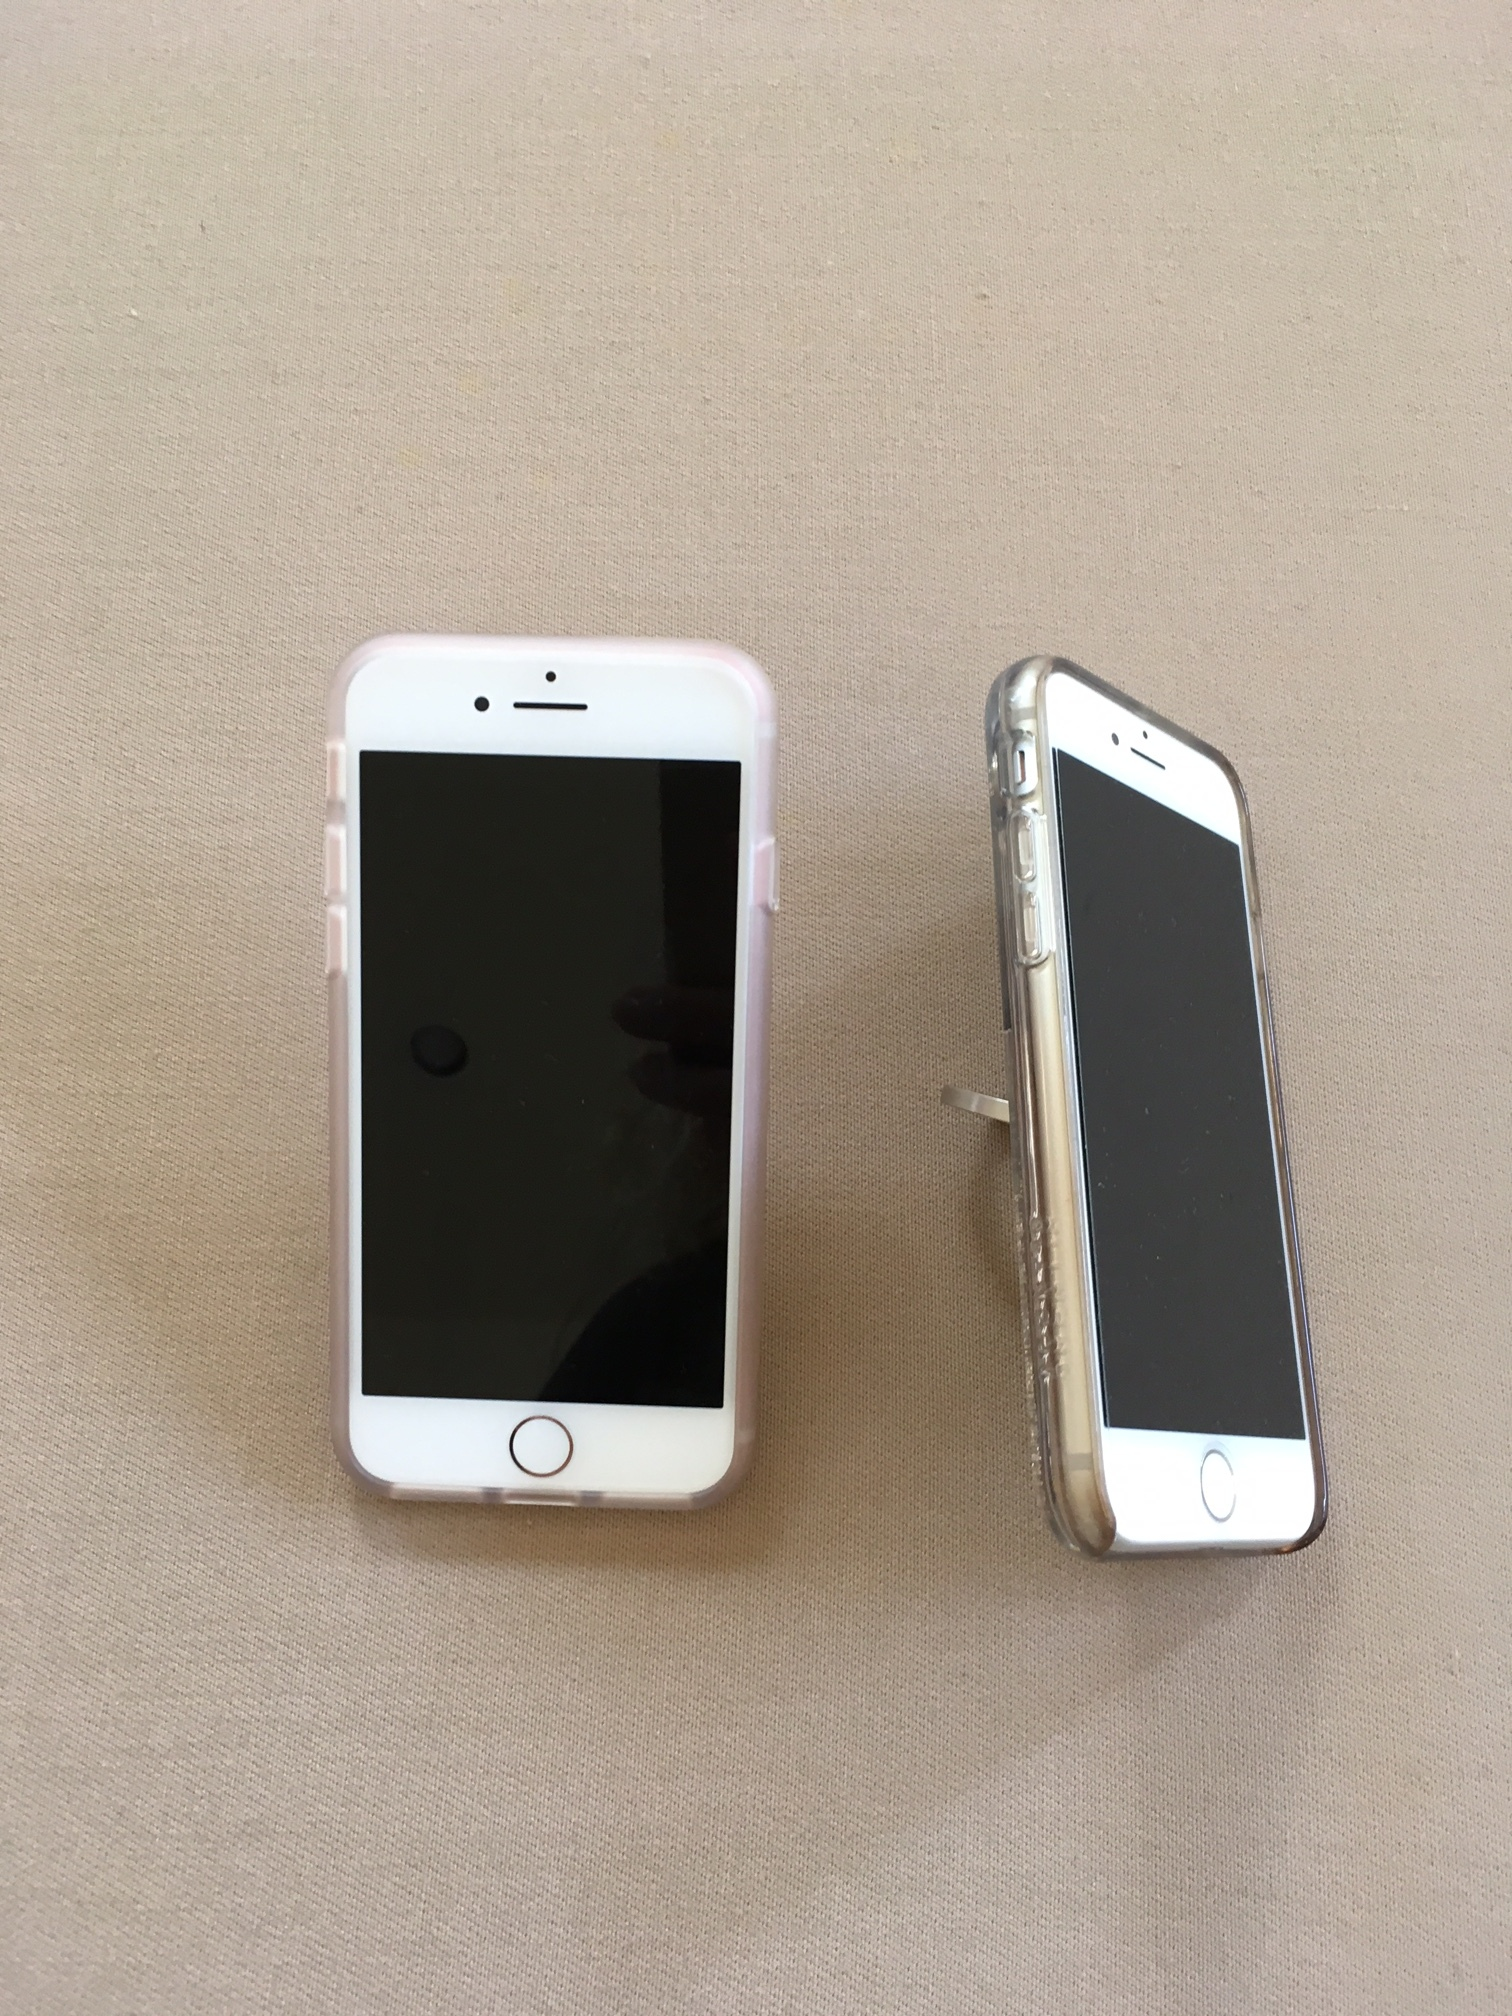 My world is 2 phones